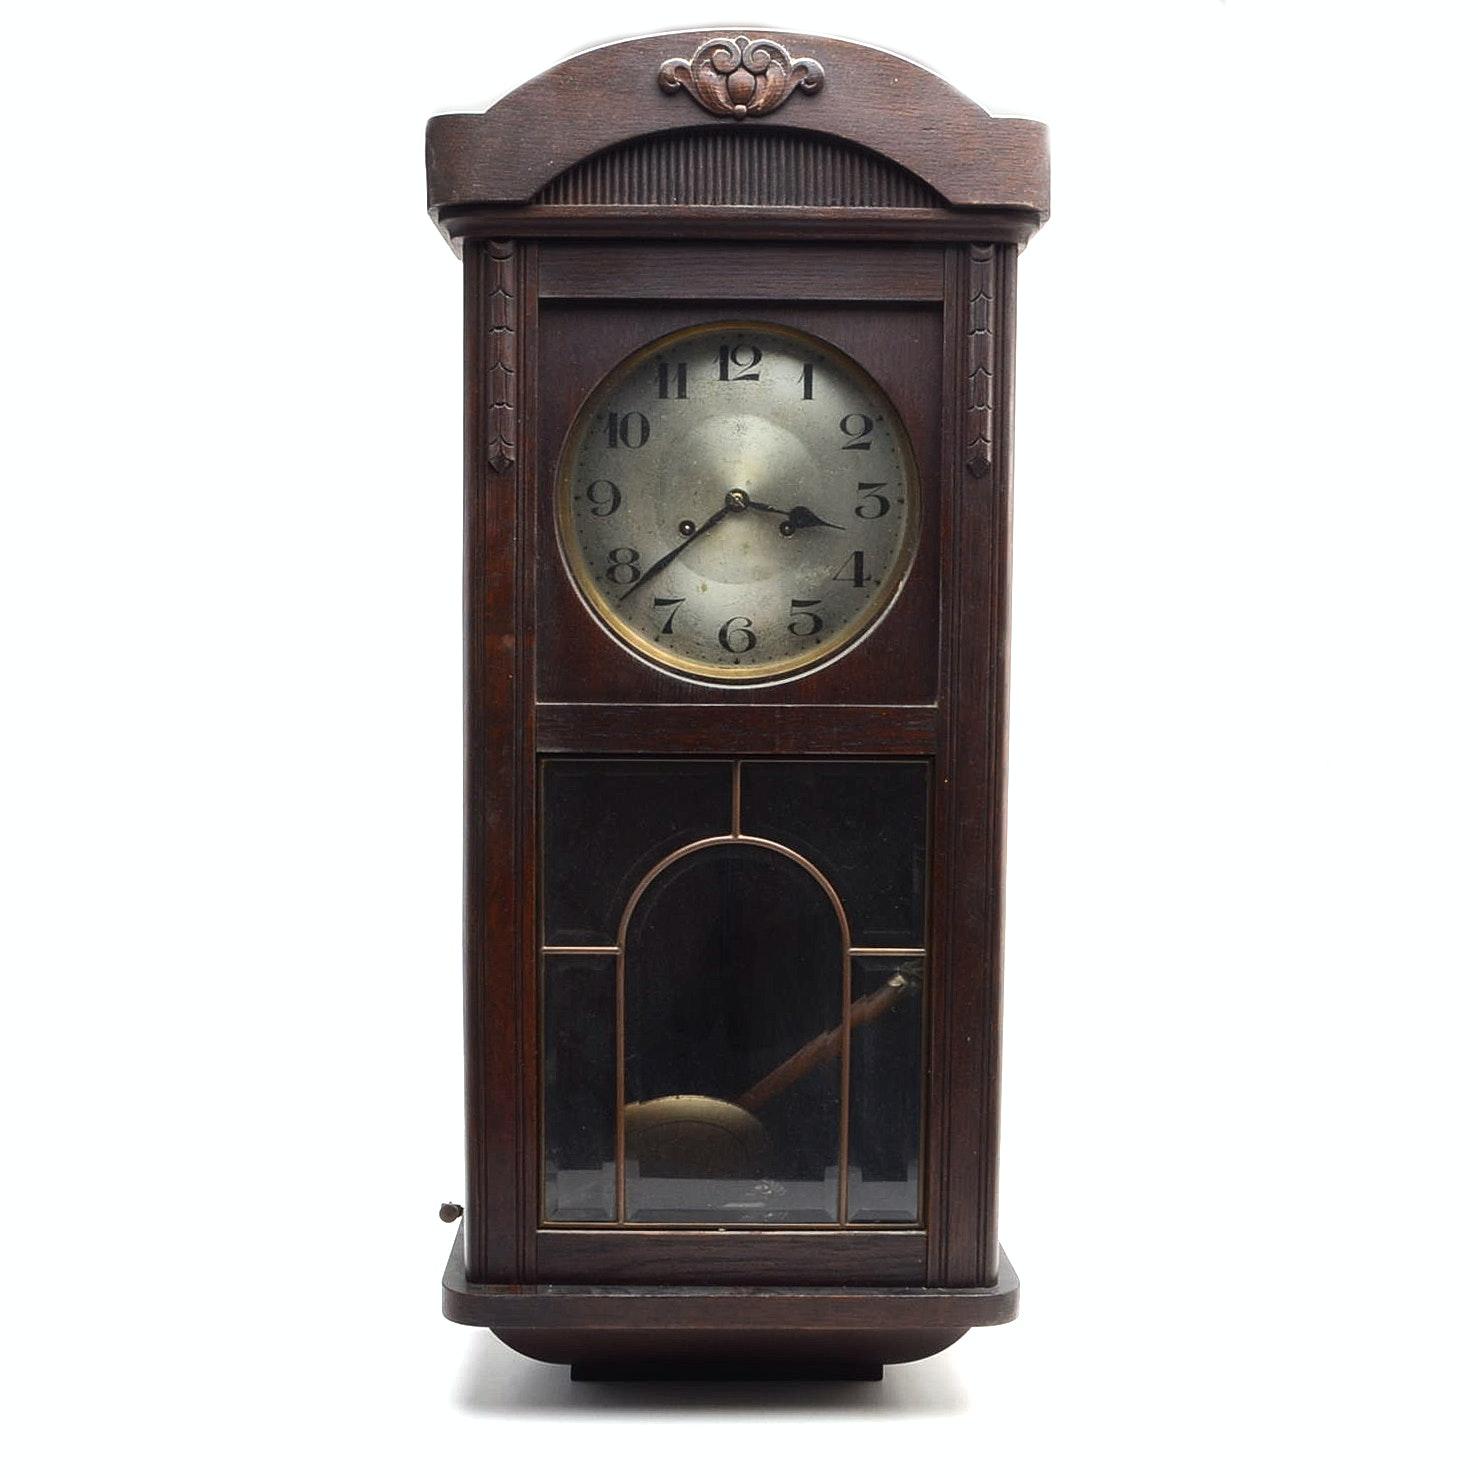 Antique Junghan's Walnut Wall Clock